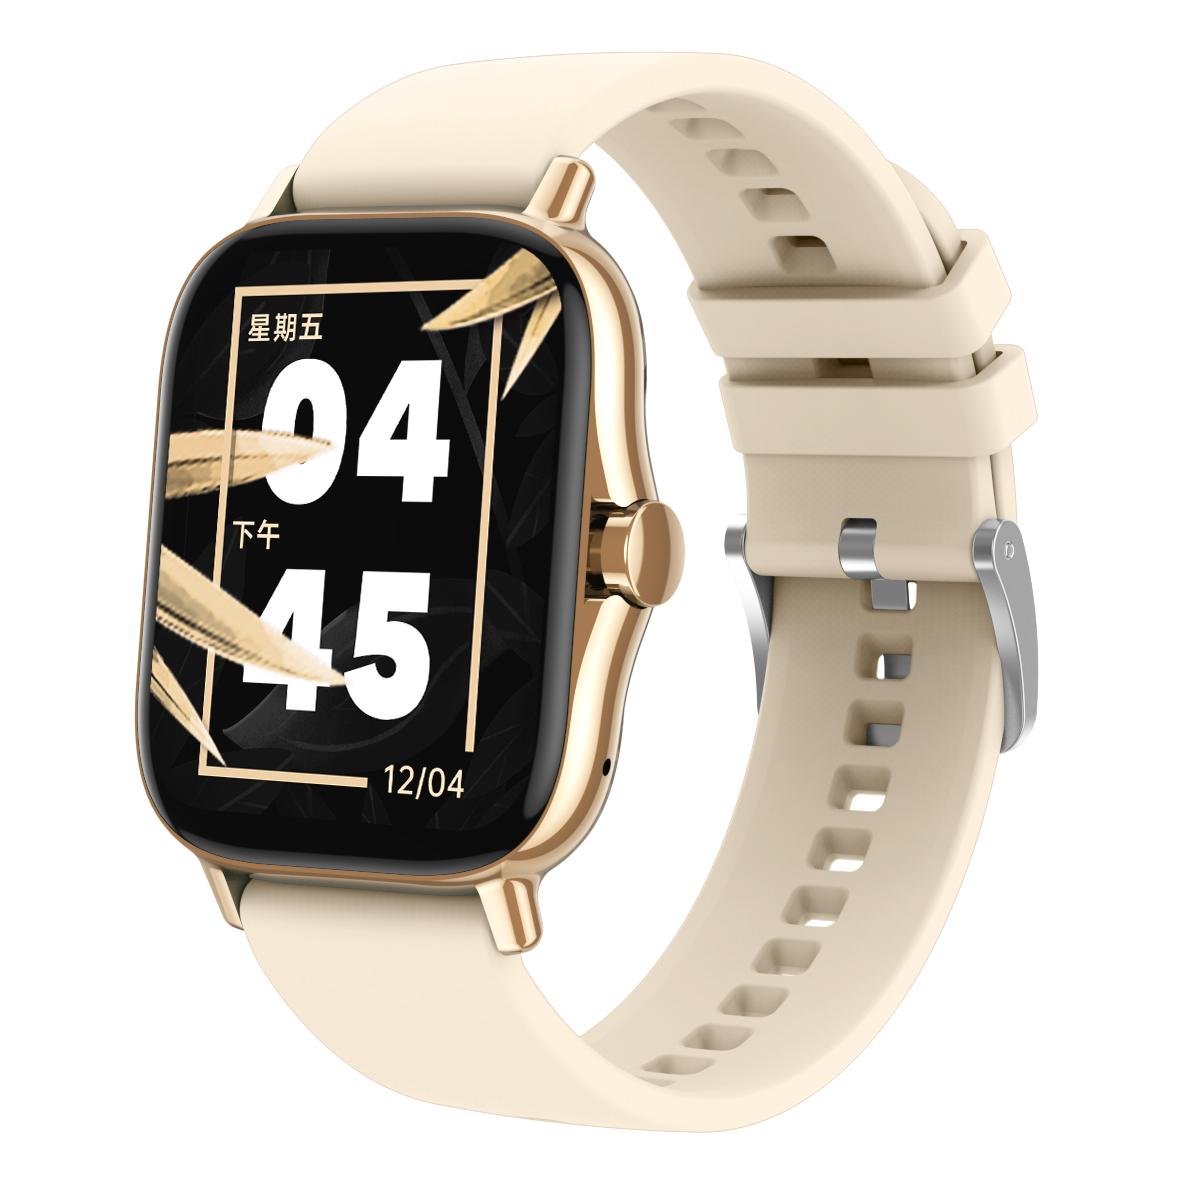 Dw11 Smart  Watch Heart Rate Blood Pressure Bluetooth Call 1.63 Hd Full-screen Multi-sport Watch gold